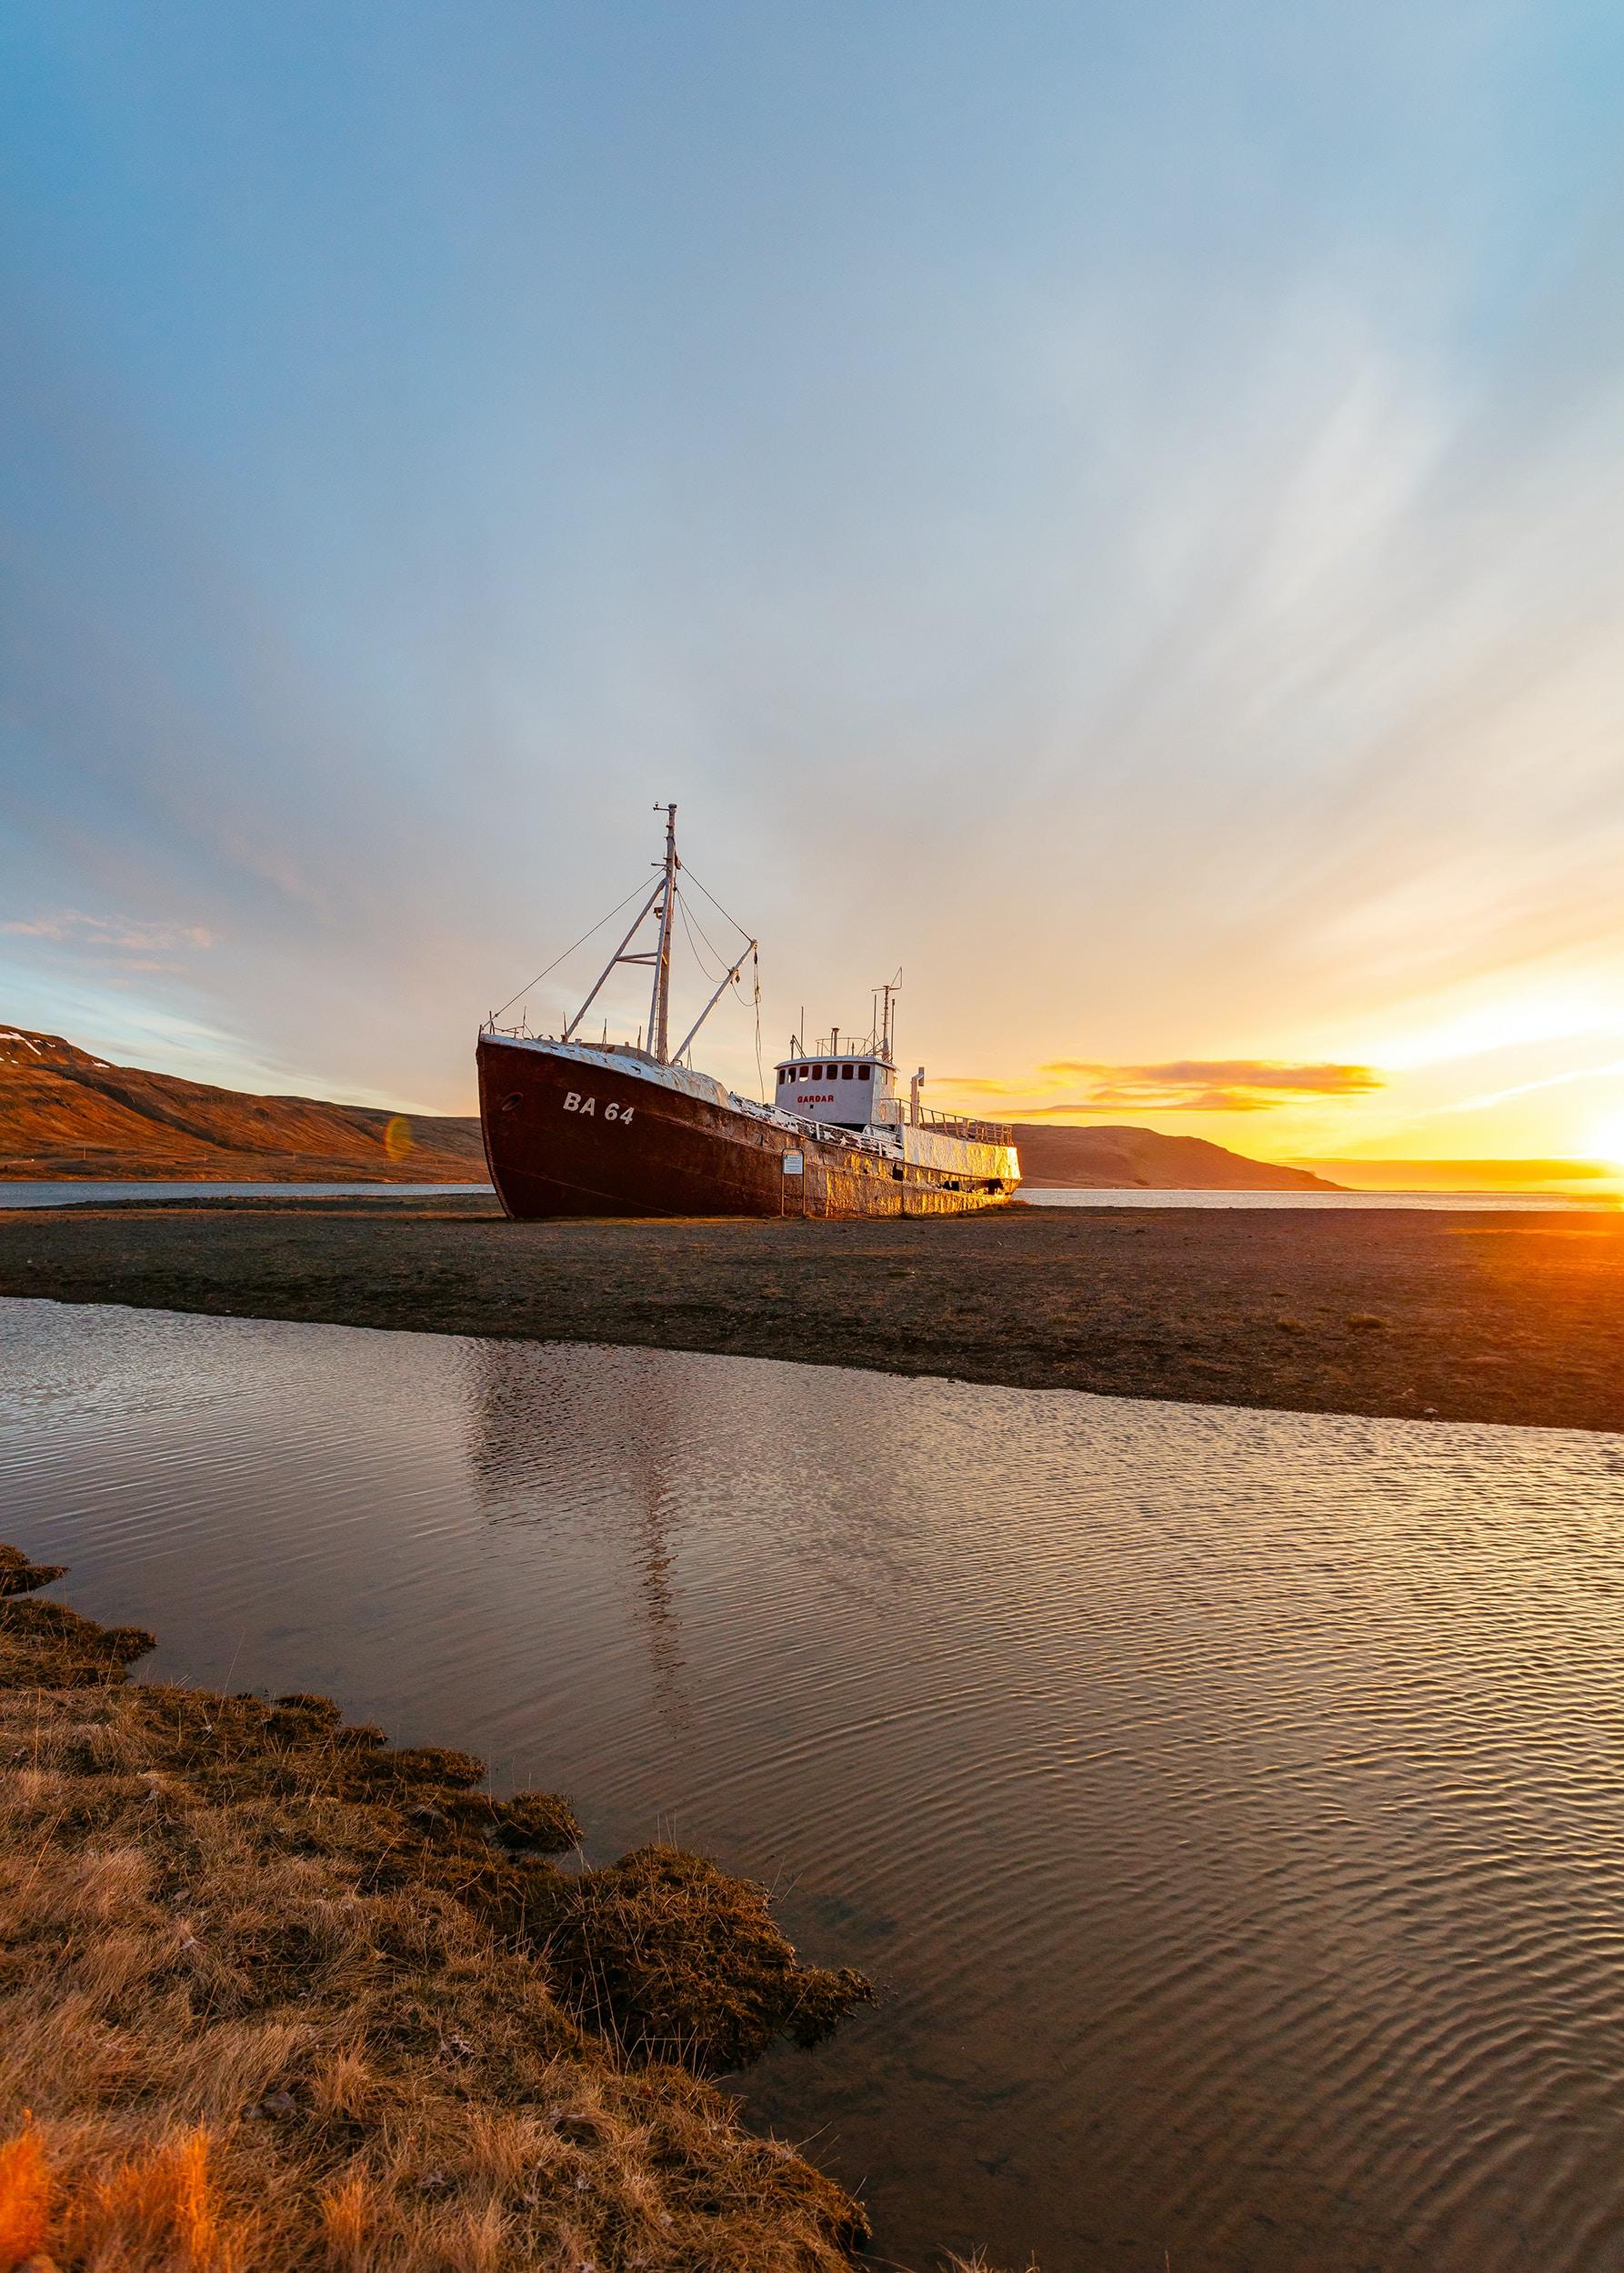 white and brown ship on seashore under sunrise